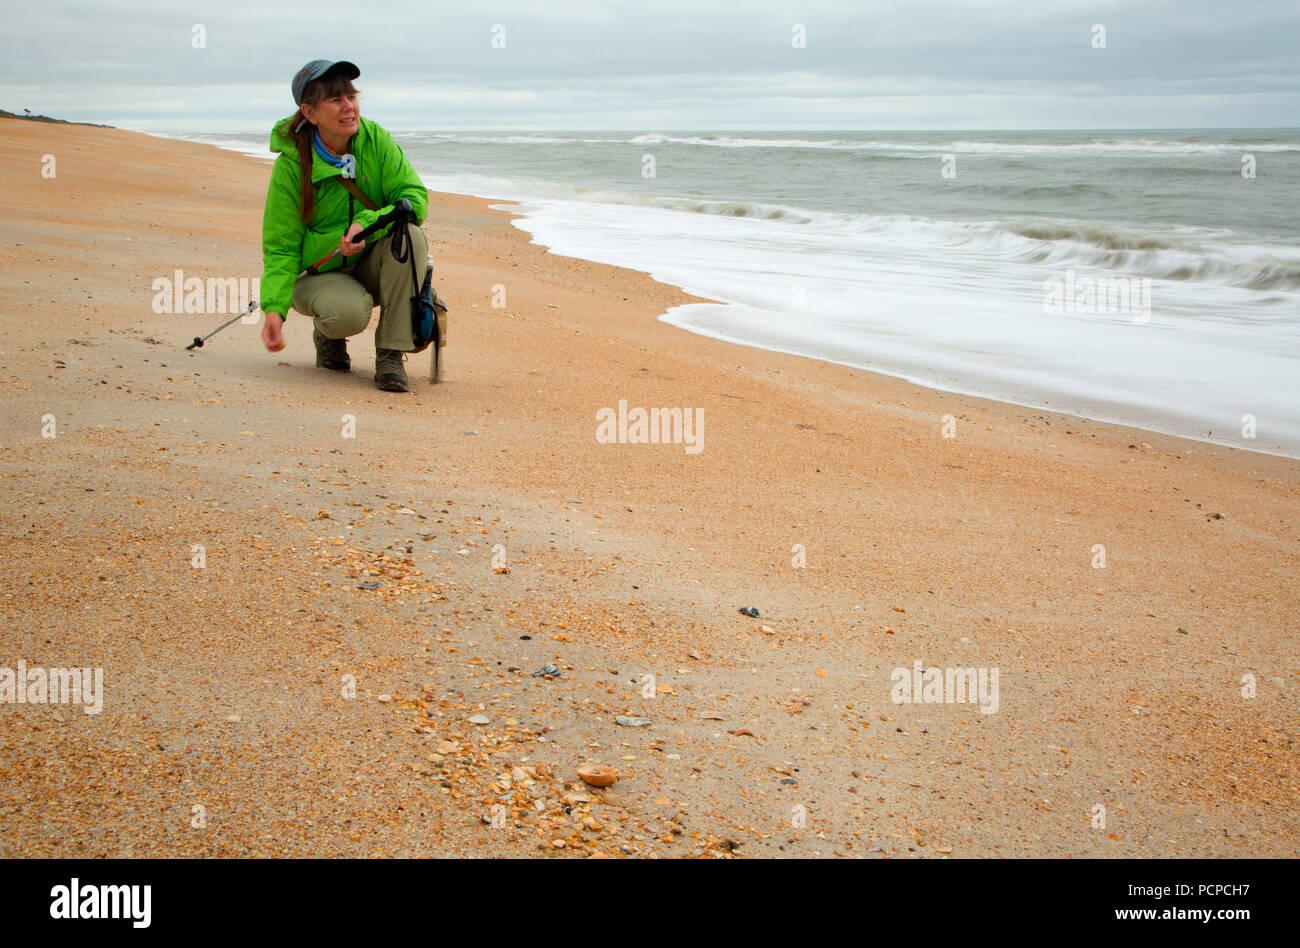 Open beach, Guana Tolomato Matanzas National Estuarine Research Reserve,  Florida - Stock Image